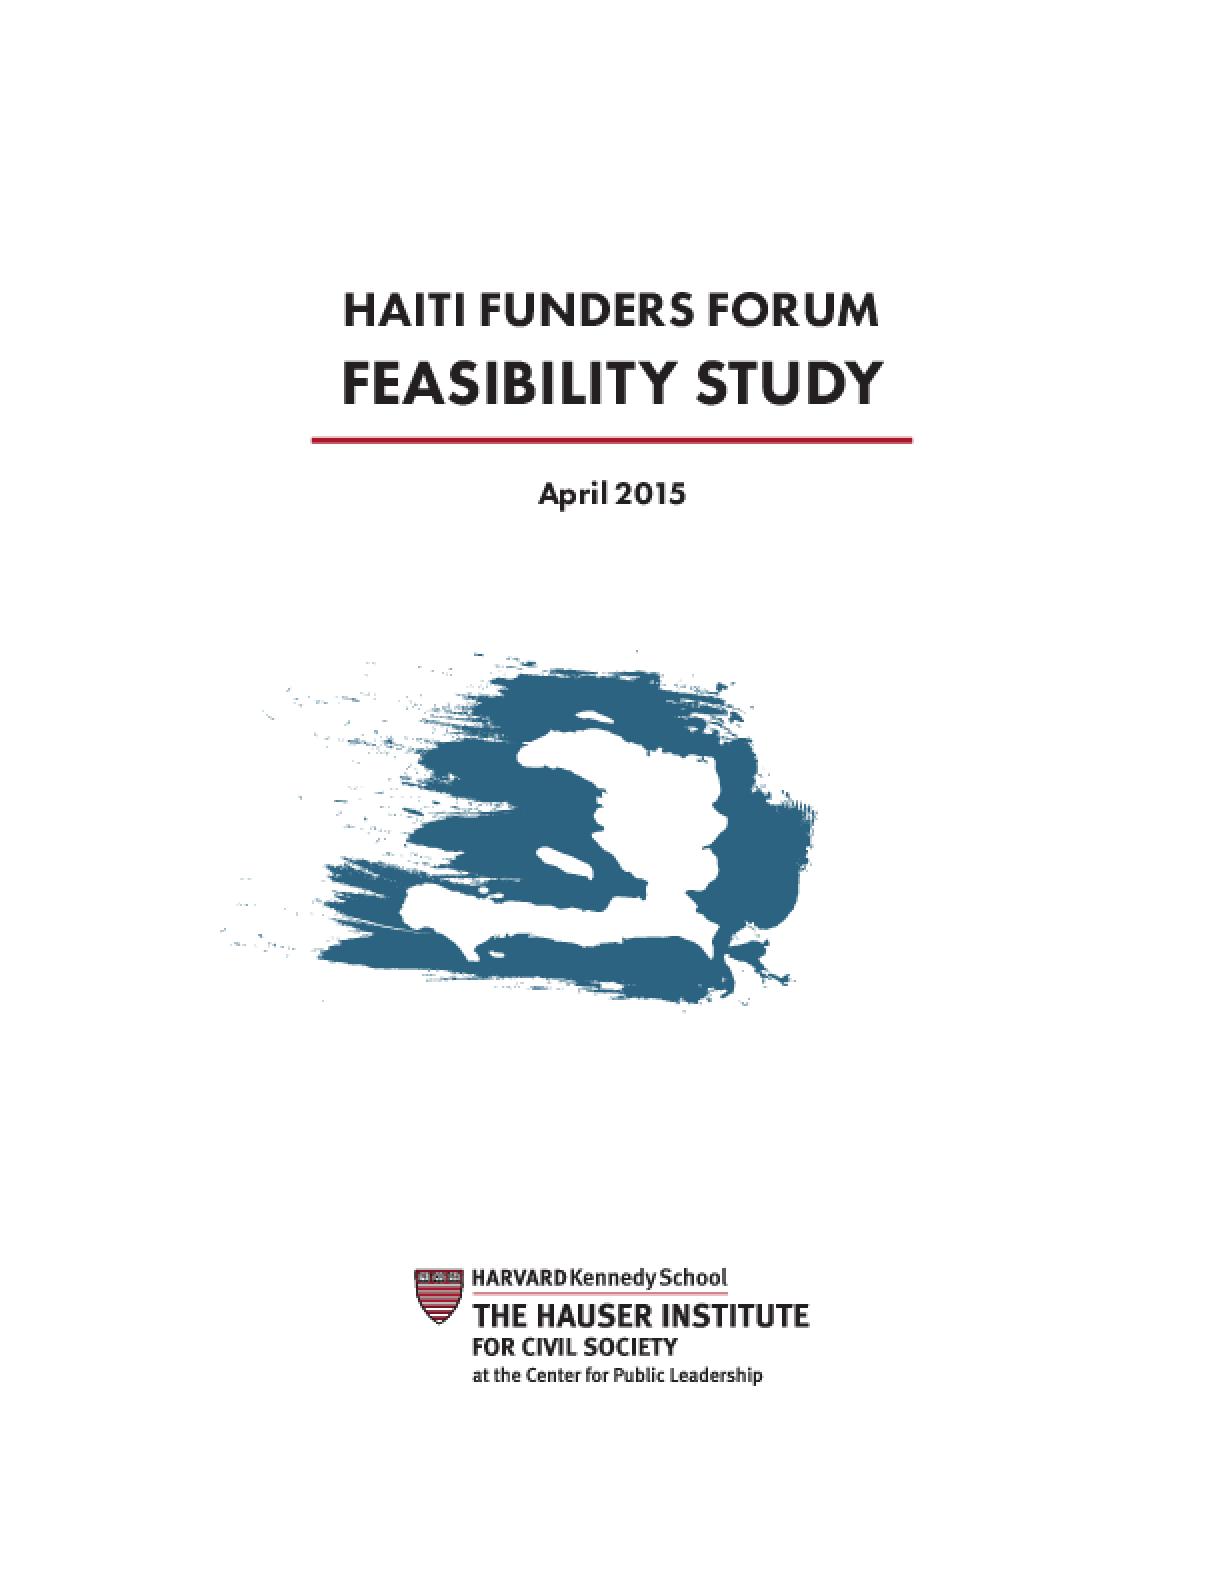 Haiti Funders Forum: Feasibility Study